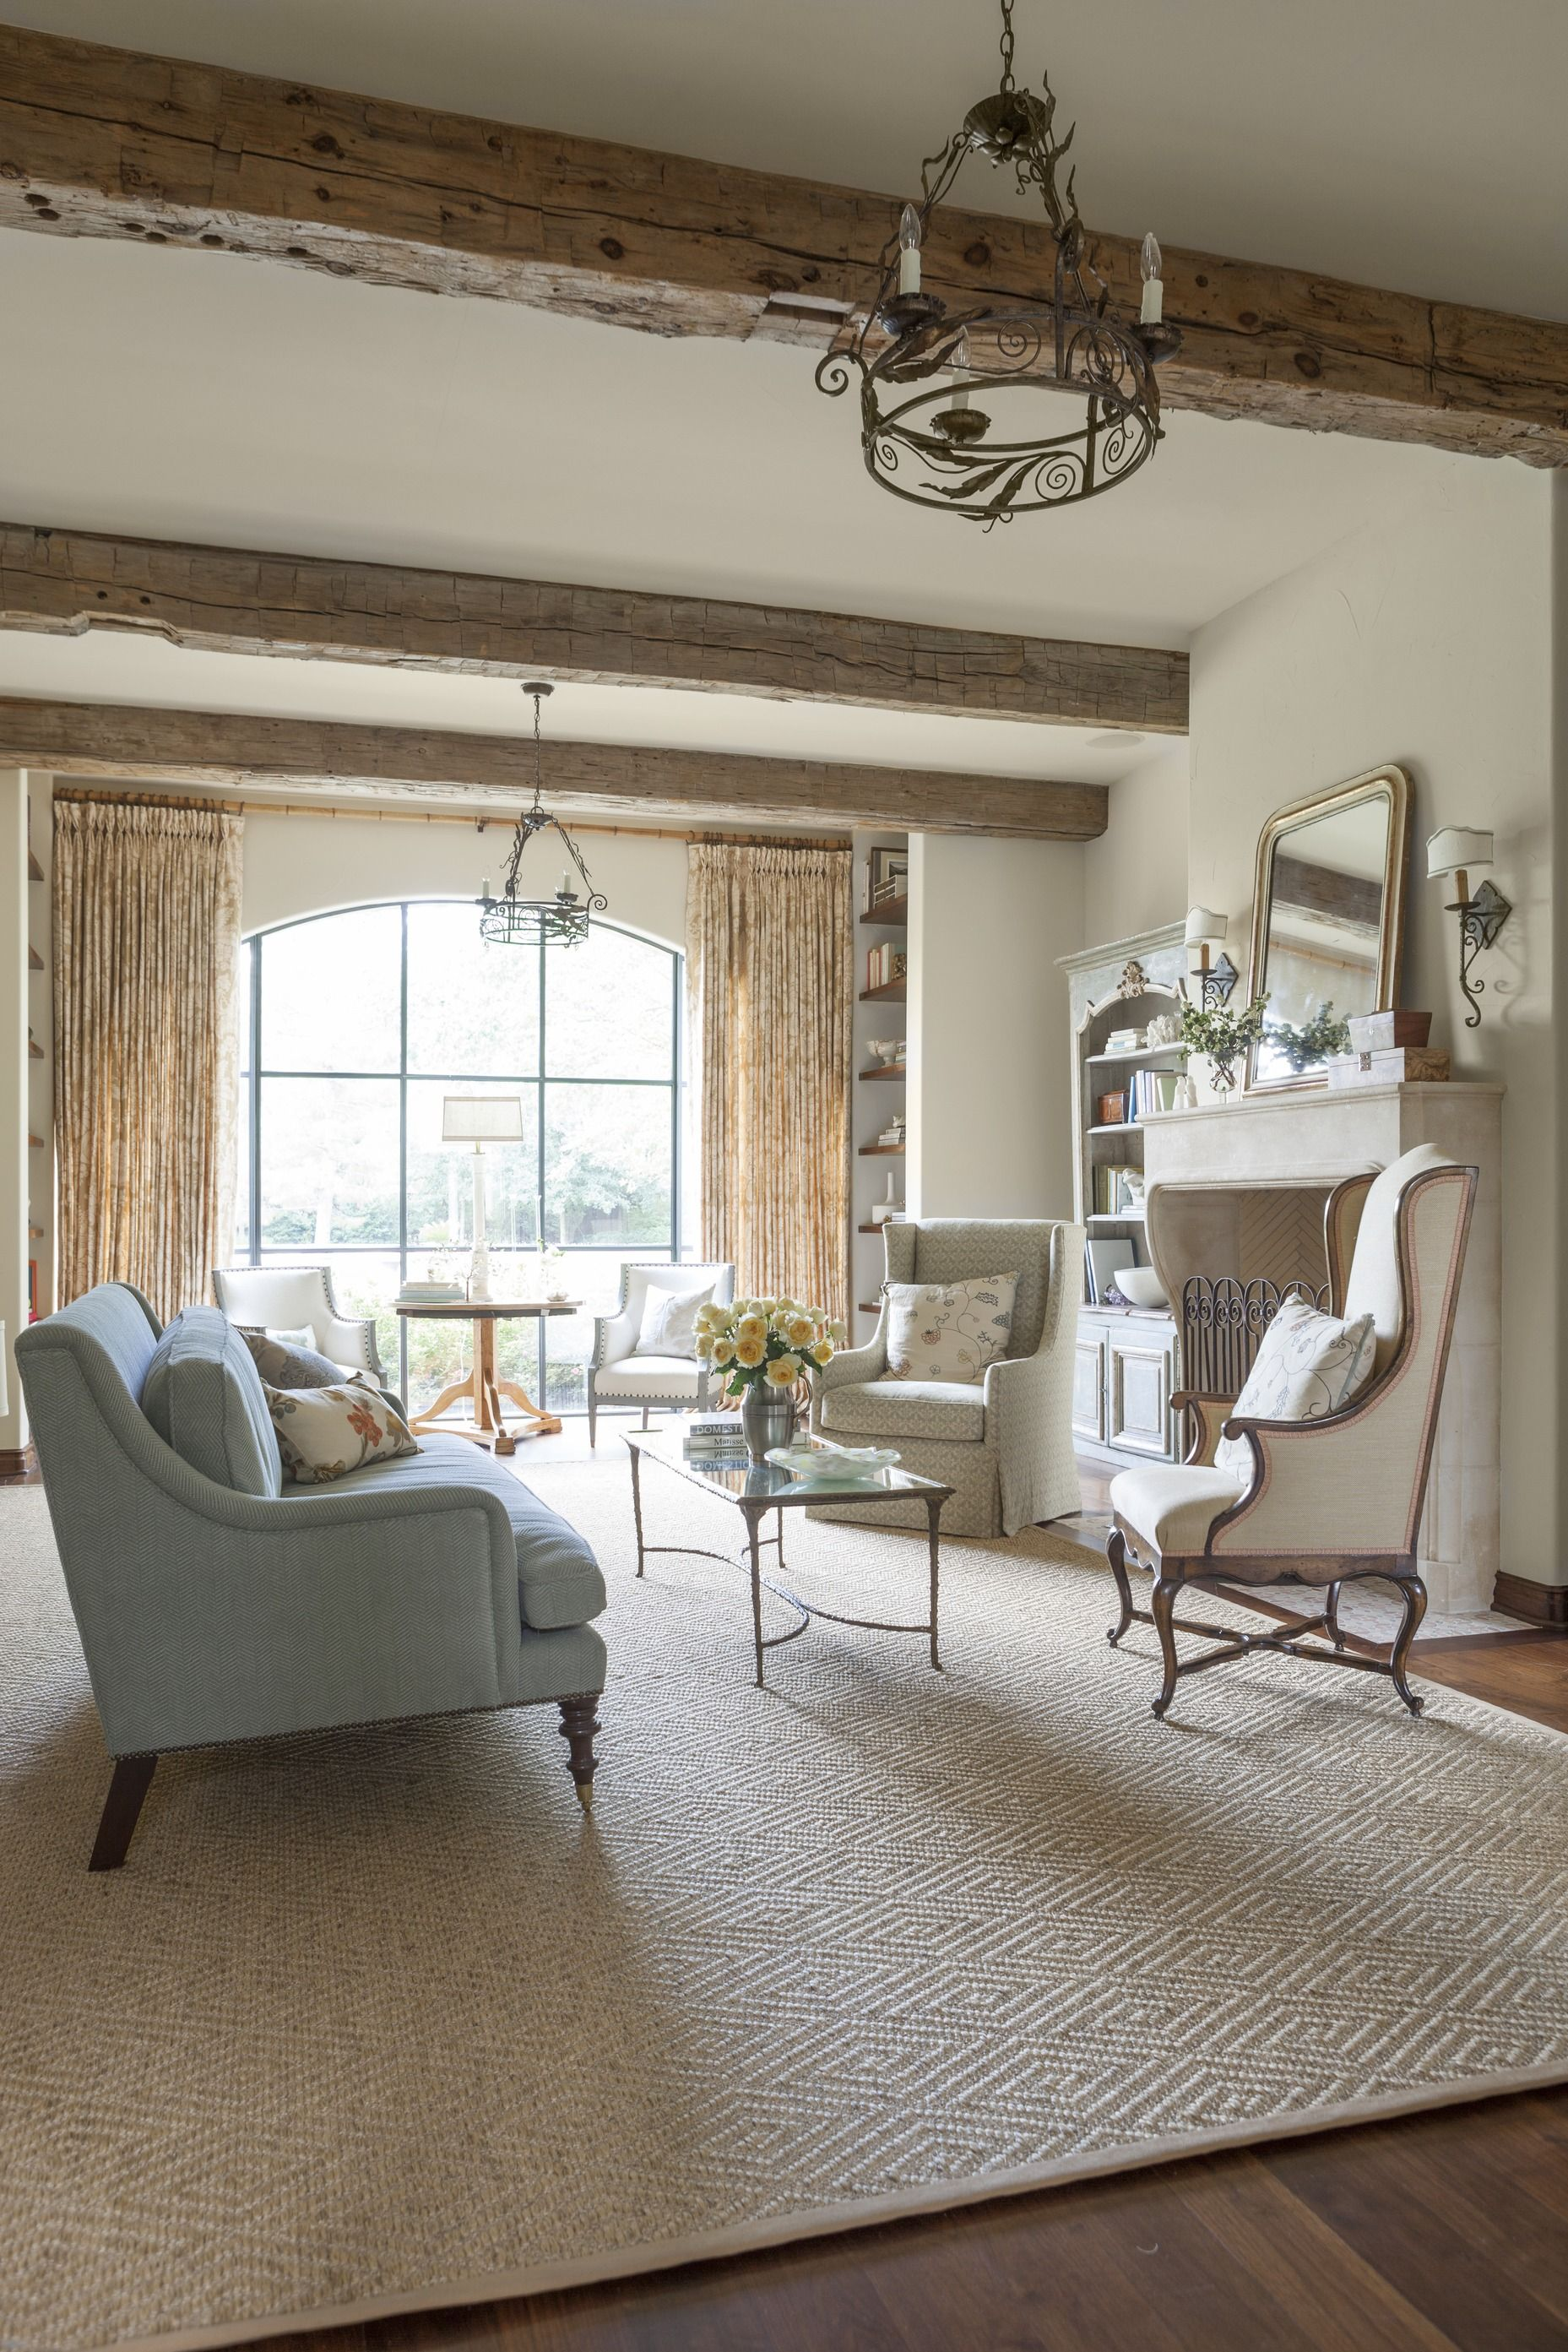 Texas Home With Perfect Harmony Texas Home Decor Modern Home Interior Design Home Decor